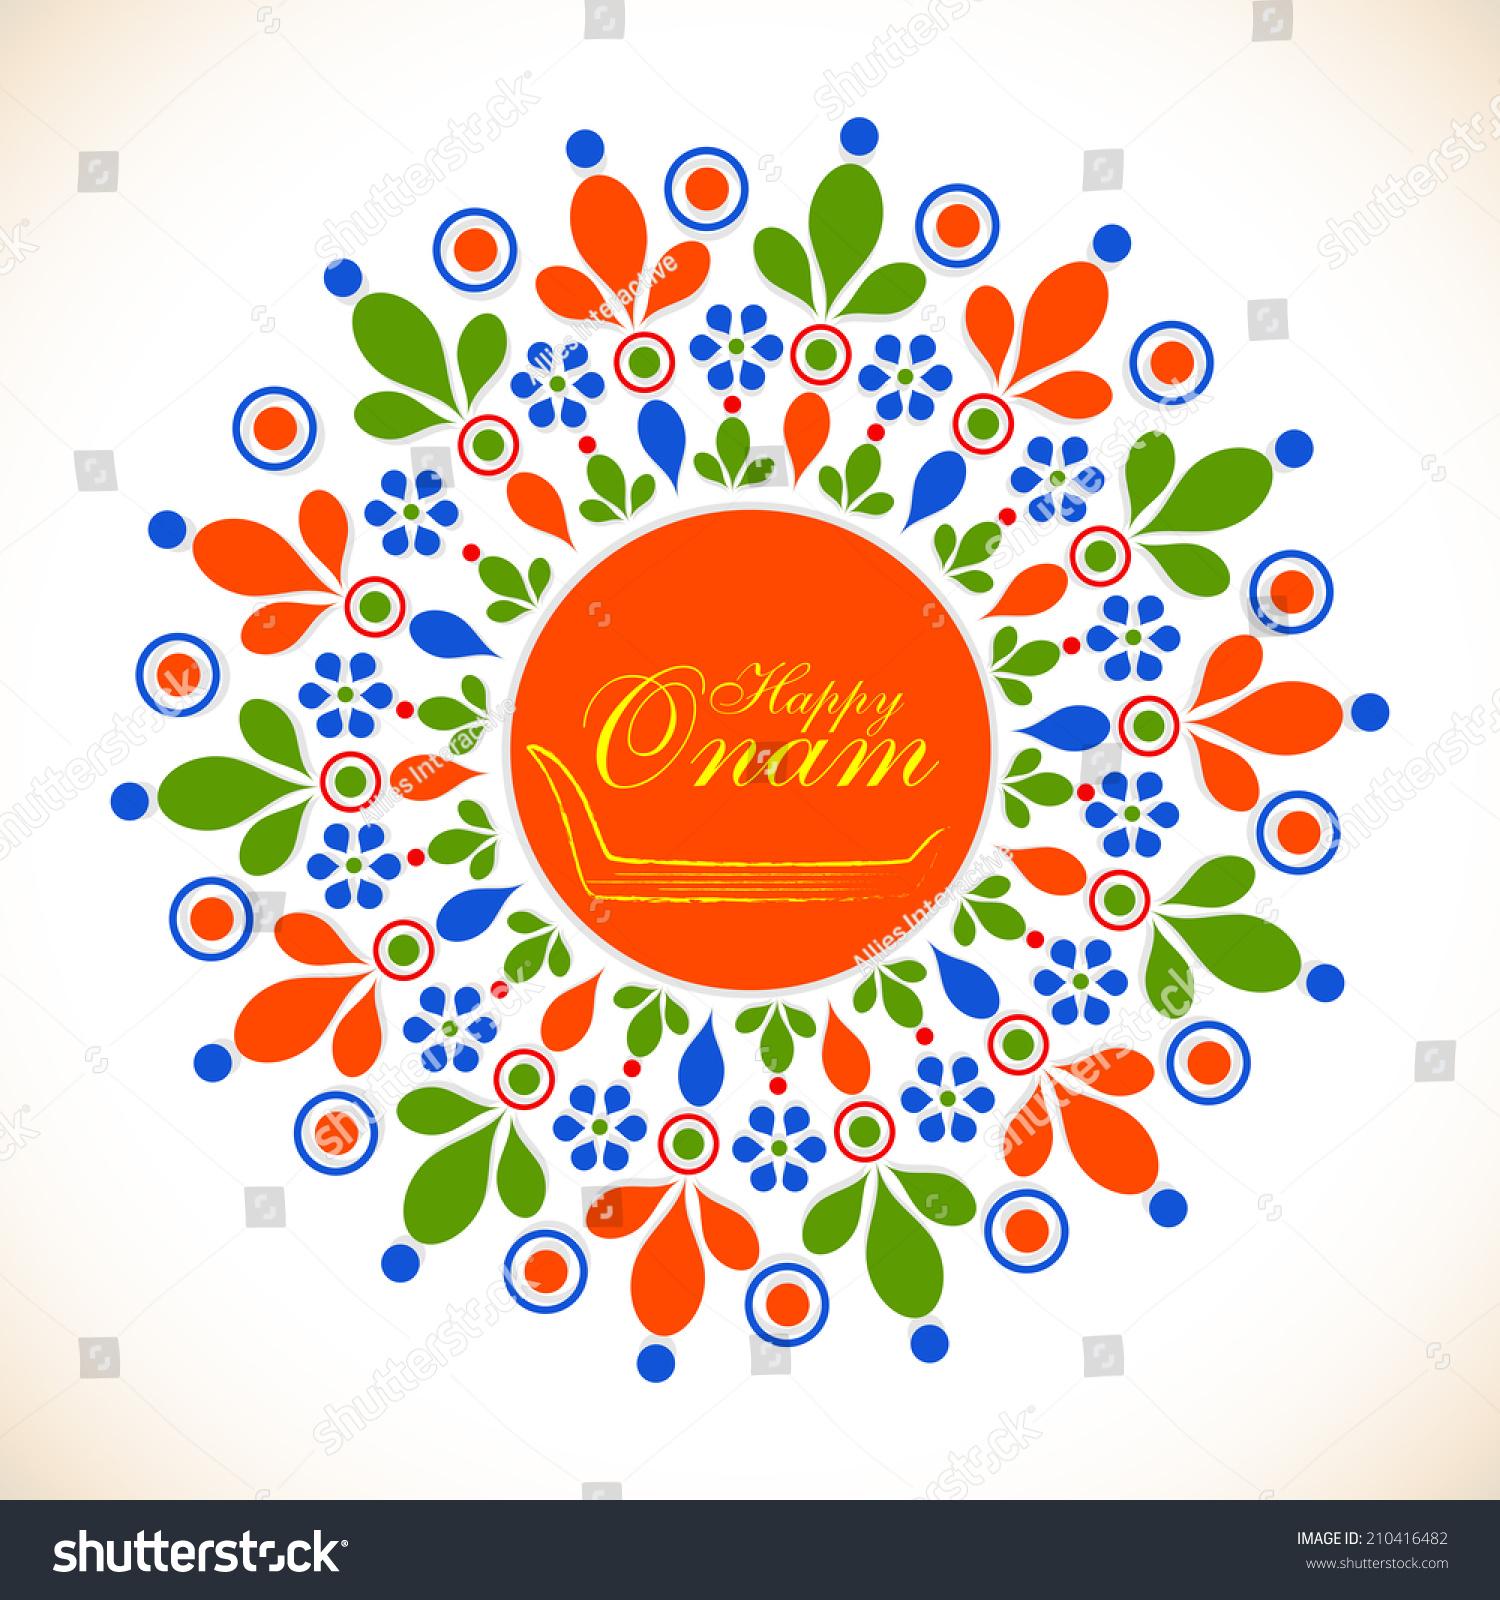 Colorful Floral Design Decorated Rangoli Snake Stock Vector ... for Flower Rangoli Vector  555kxo